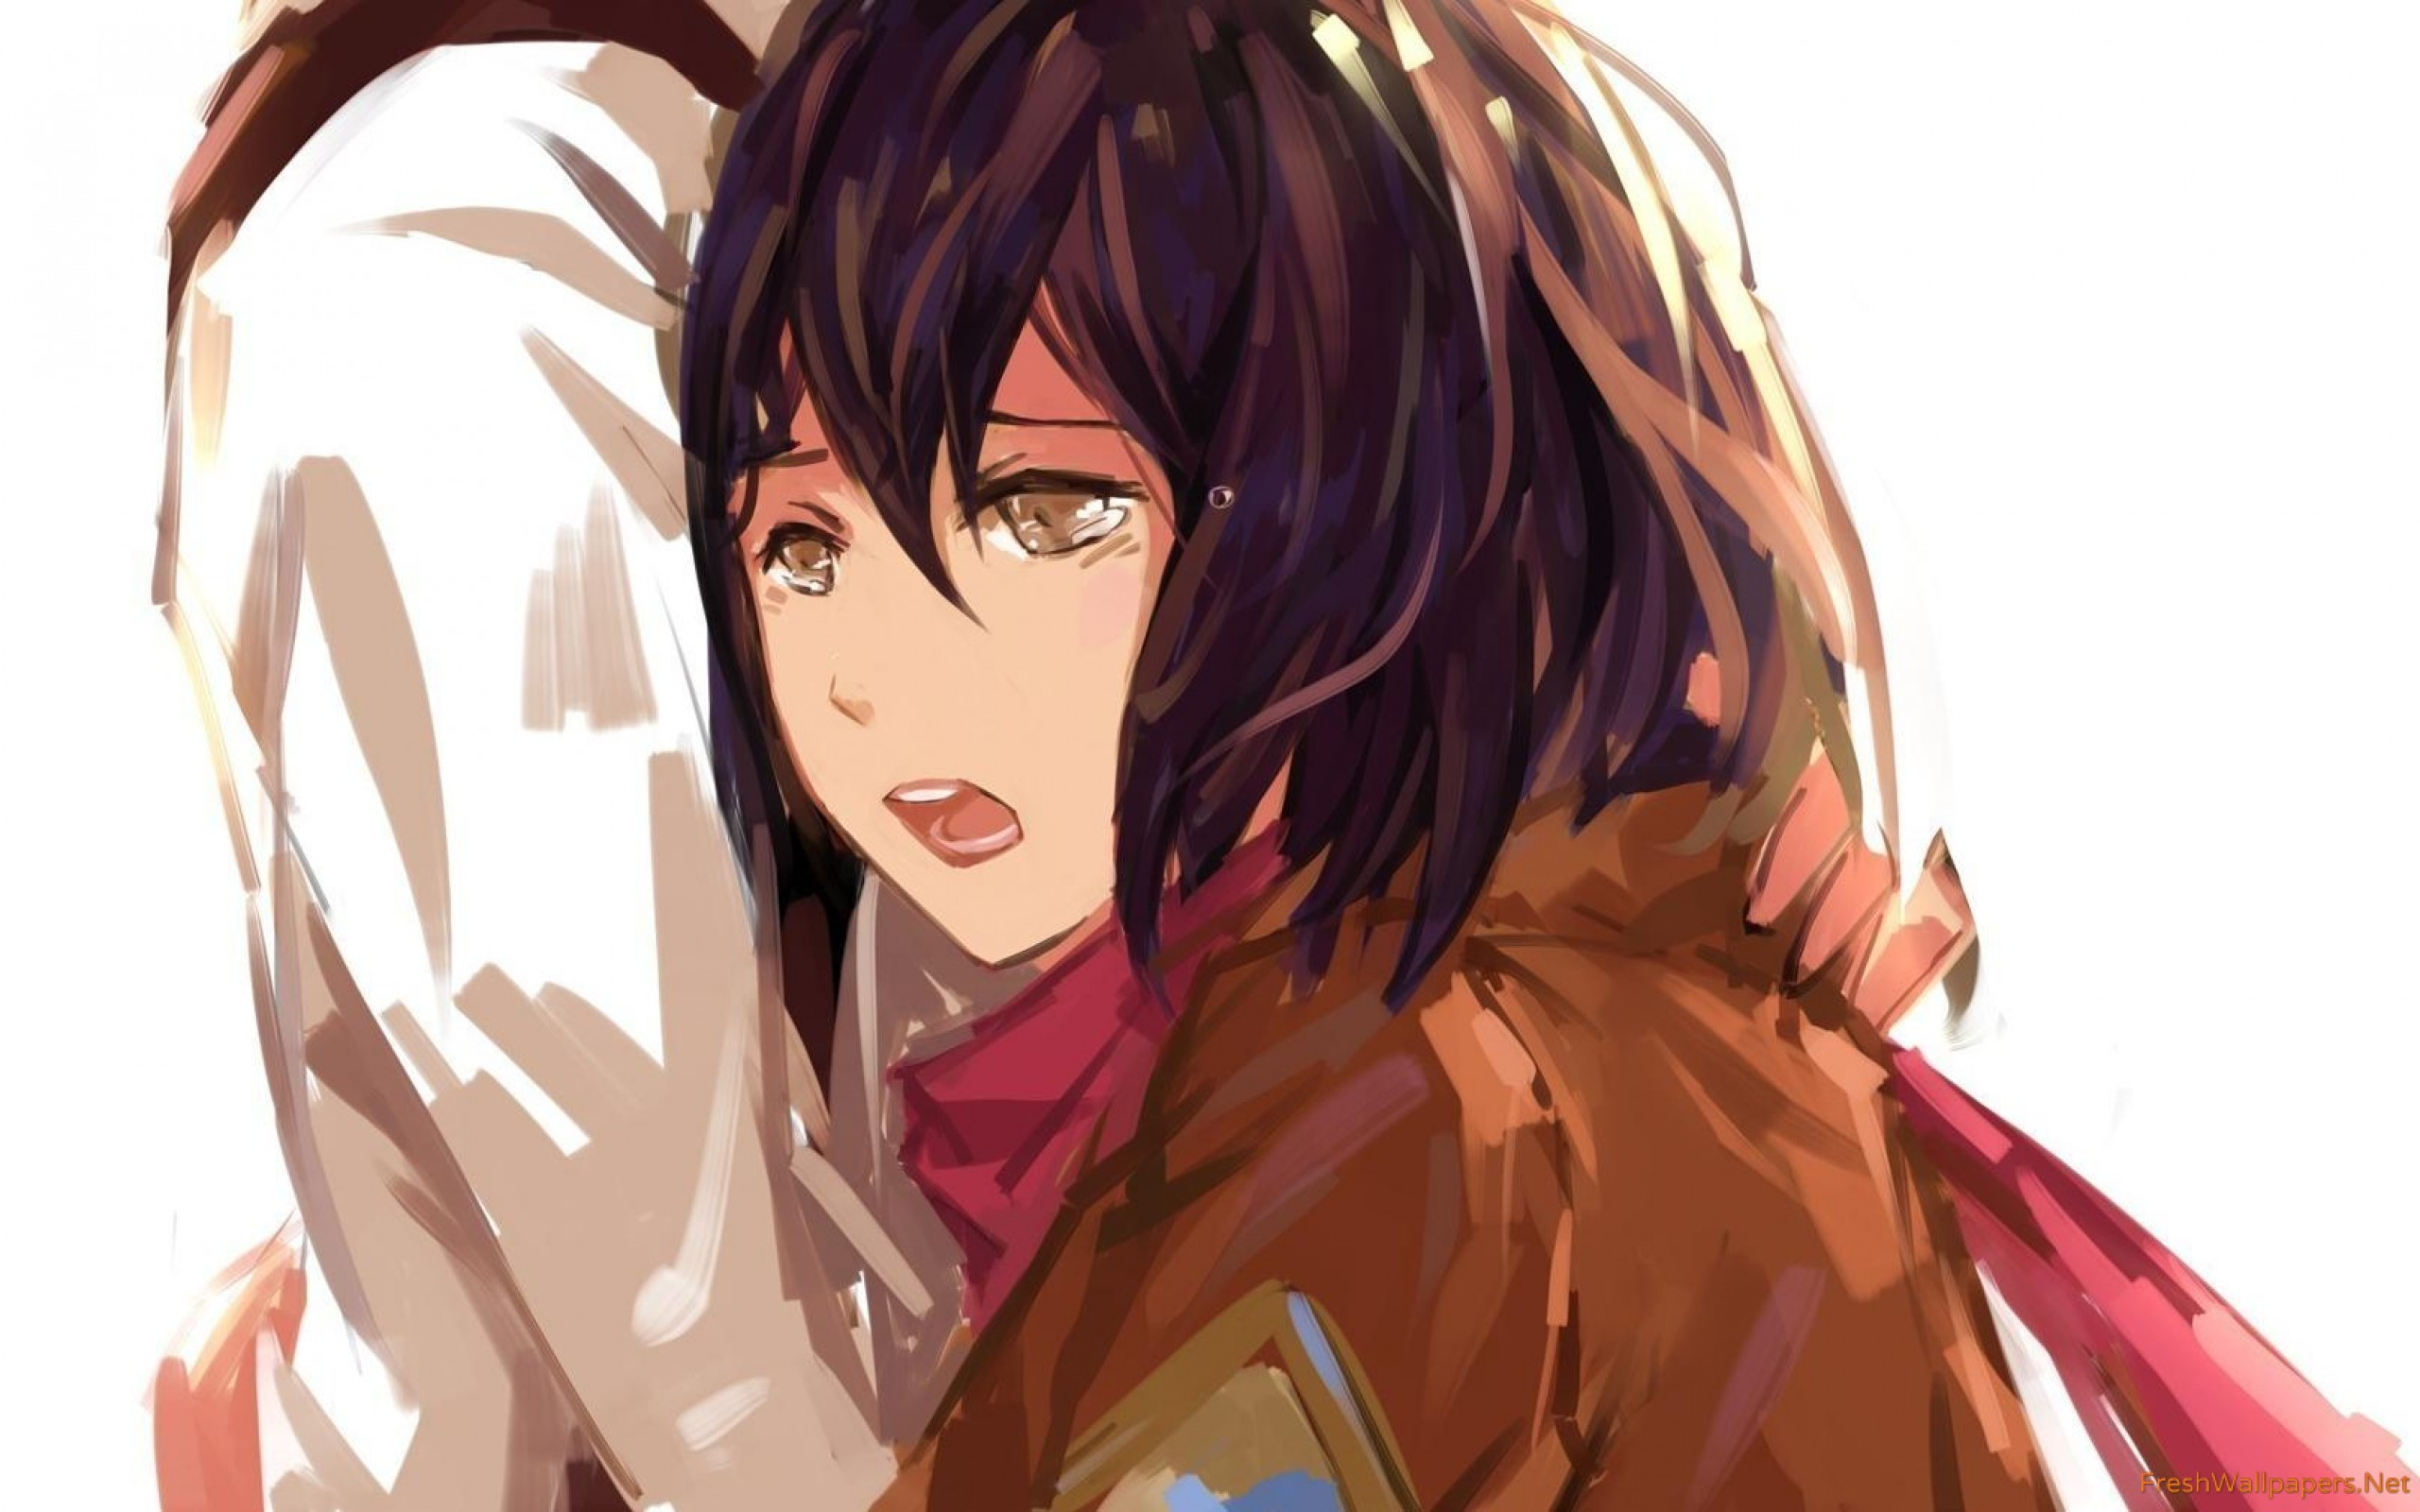 Hd Wallpaper Mikasa Ackerman Cool 2560x1600 Wallpaper Teahub Io